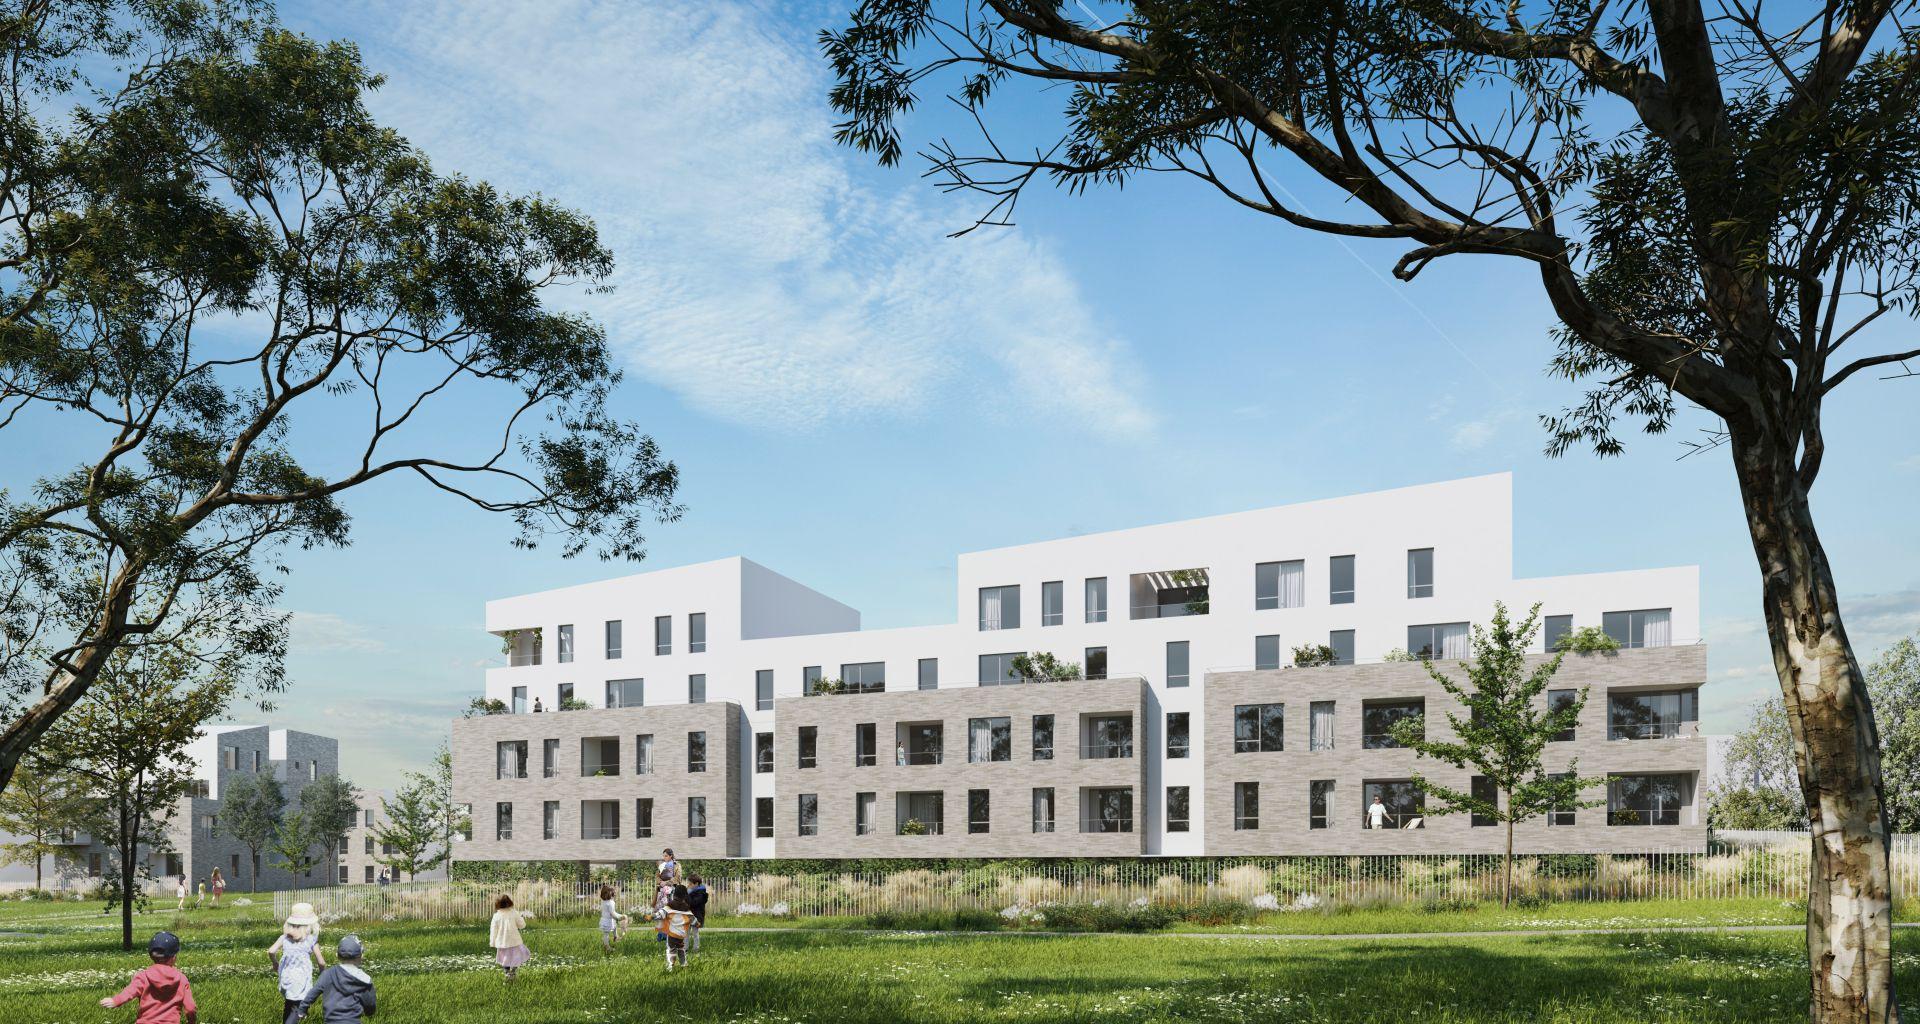 Supervue nakache orihuela architectes lgt bruyere le chatel Medium